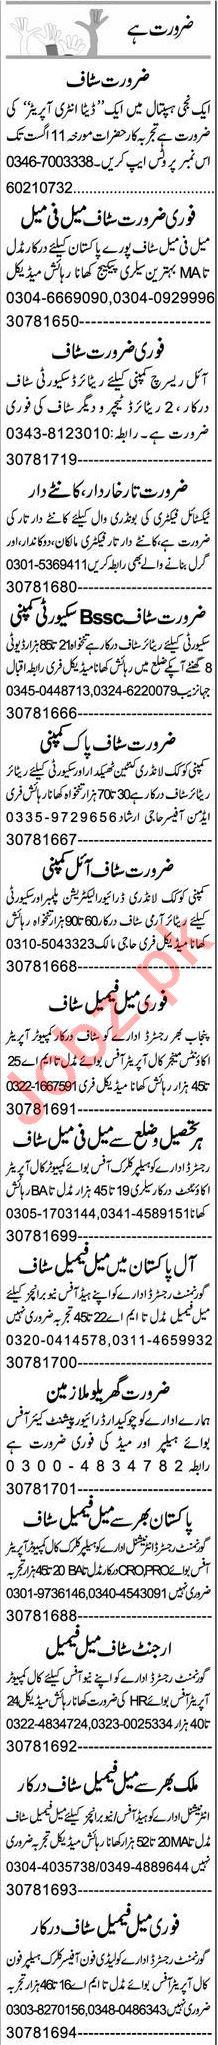 Data Entry Operator & Software Engineer Jobs 2021 in Multan